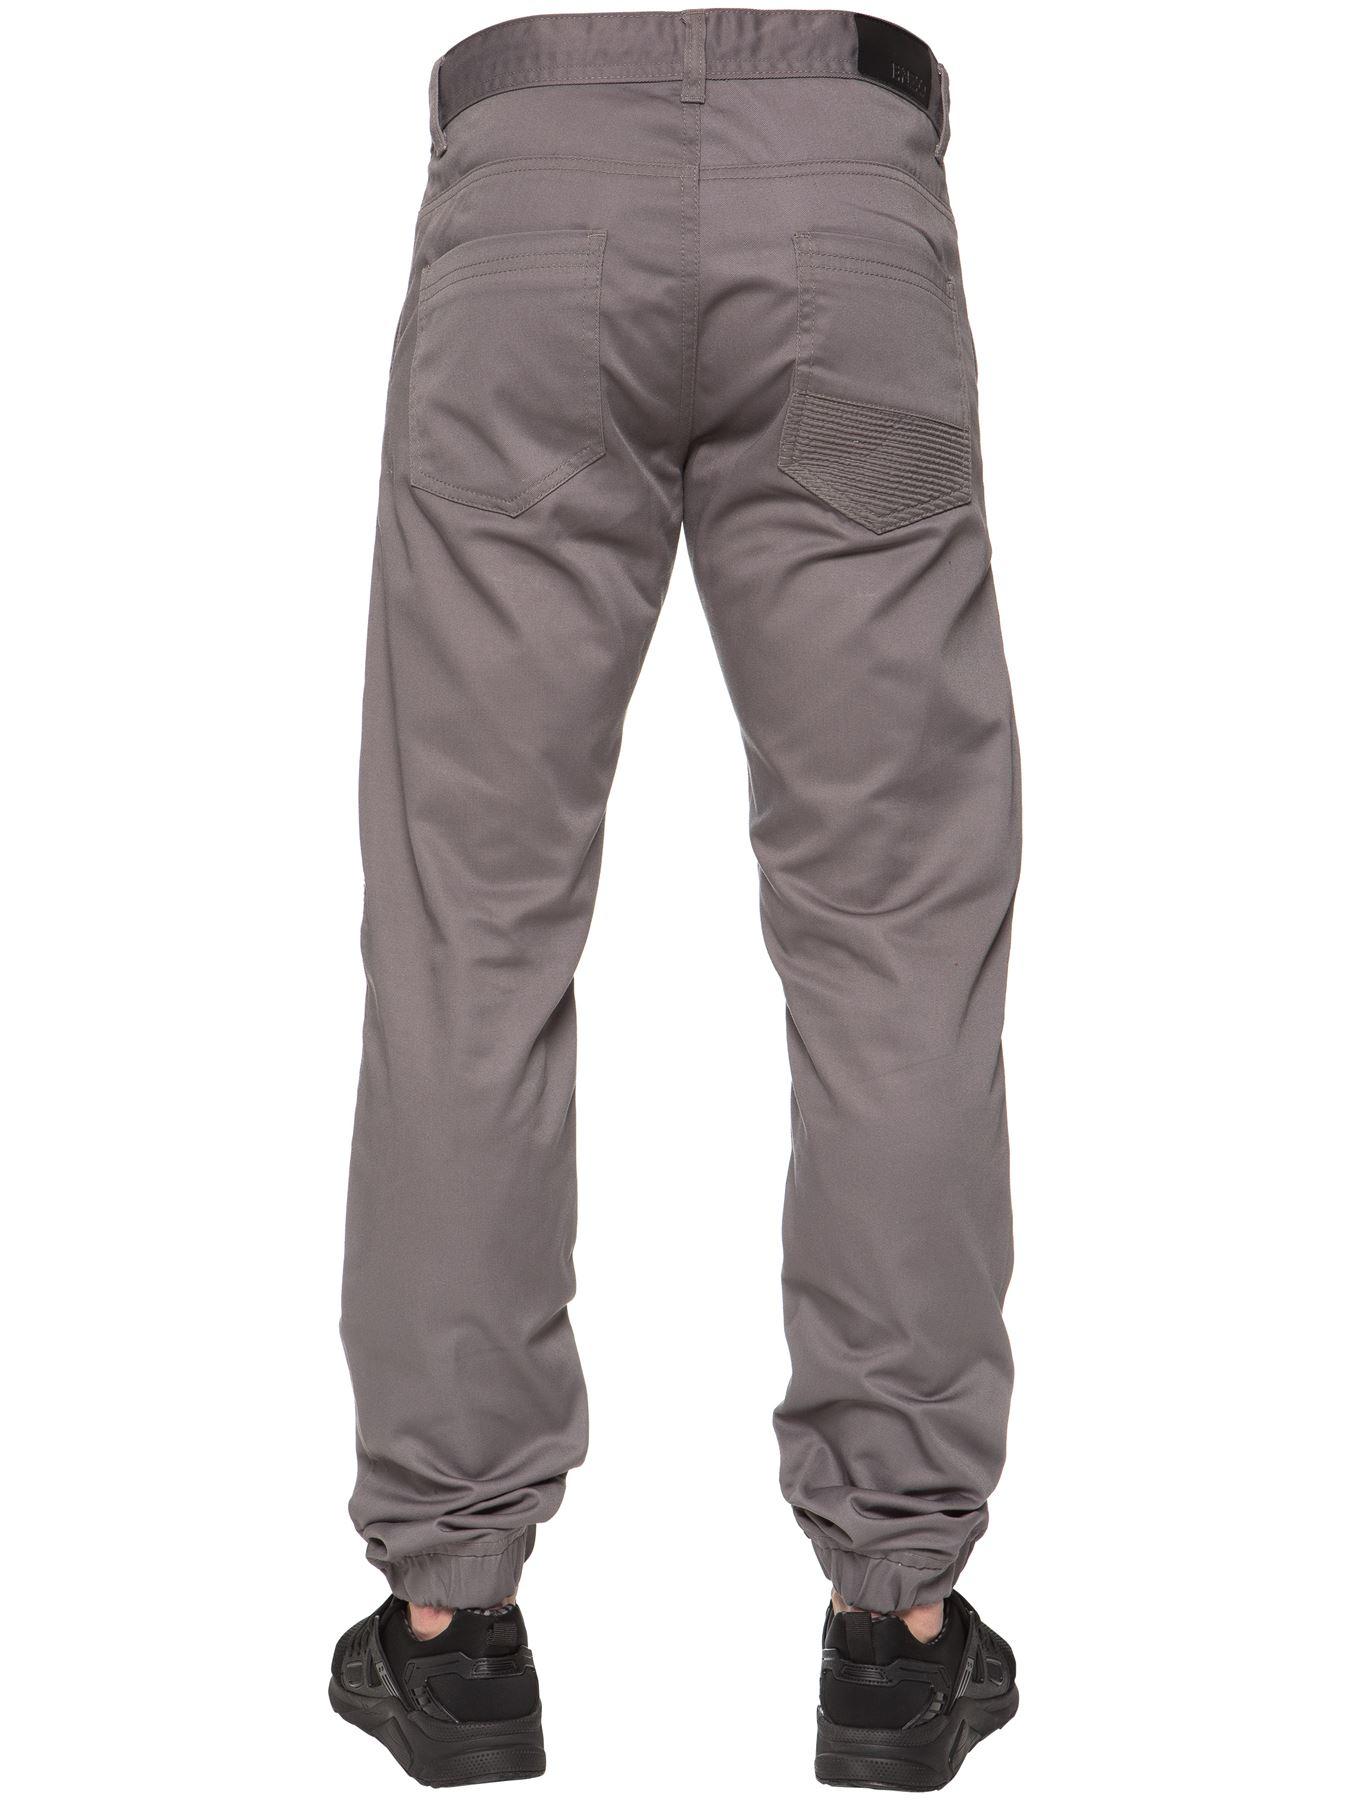 Enzo-Designer-Mens-Cuffed-Chinos-Biker-Jeans-Slim-Denim-Trousers-Pants-Joggers thumbnail 12